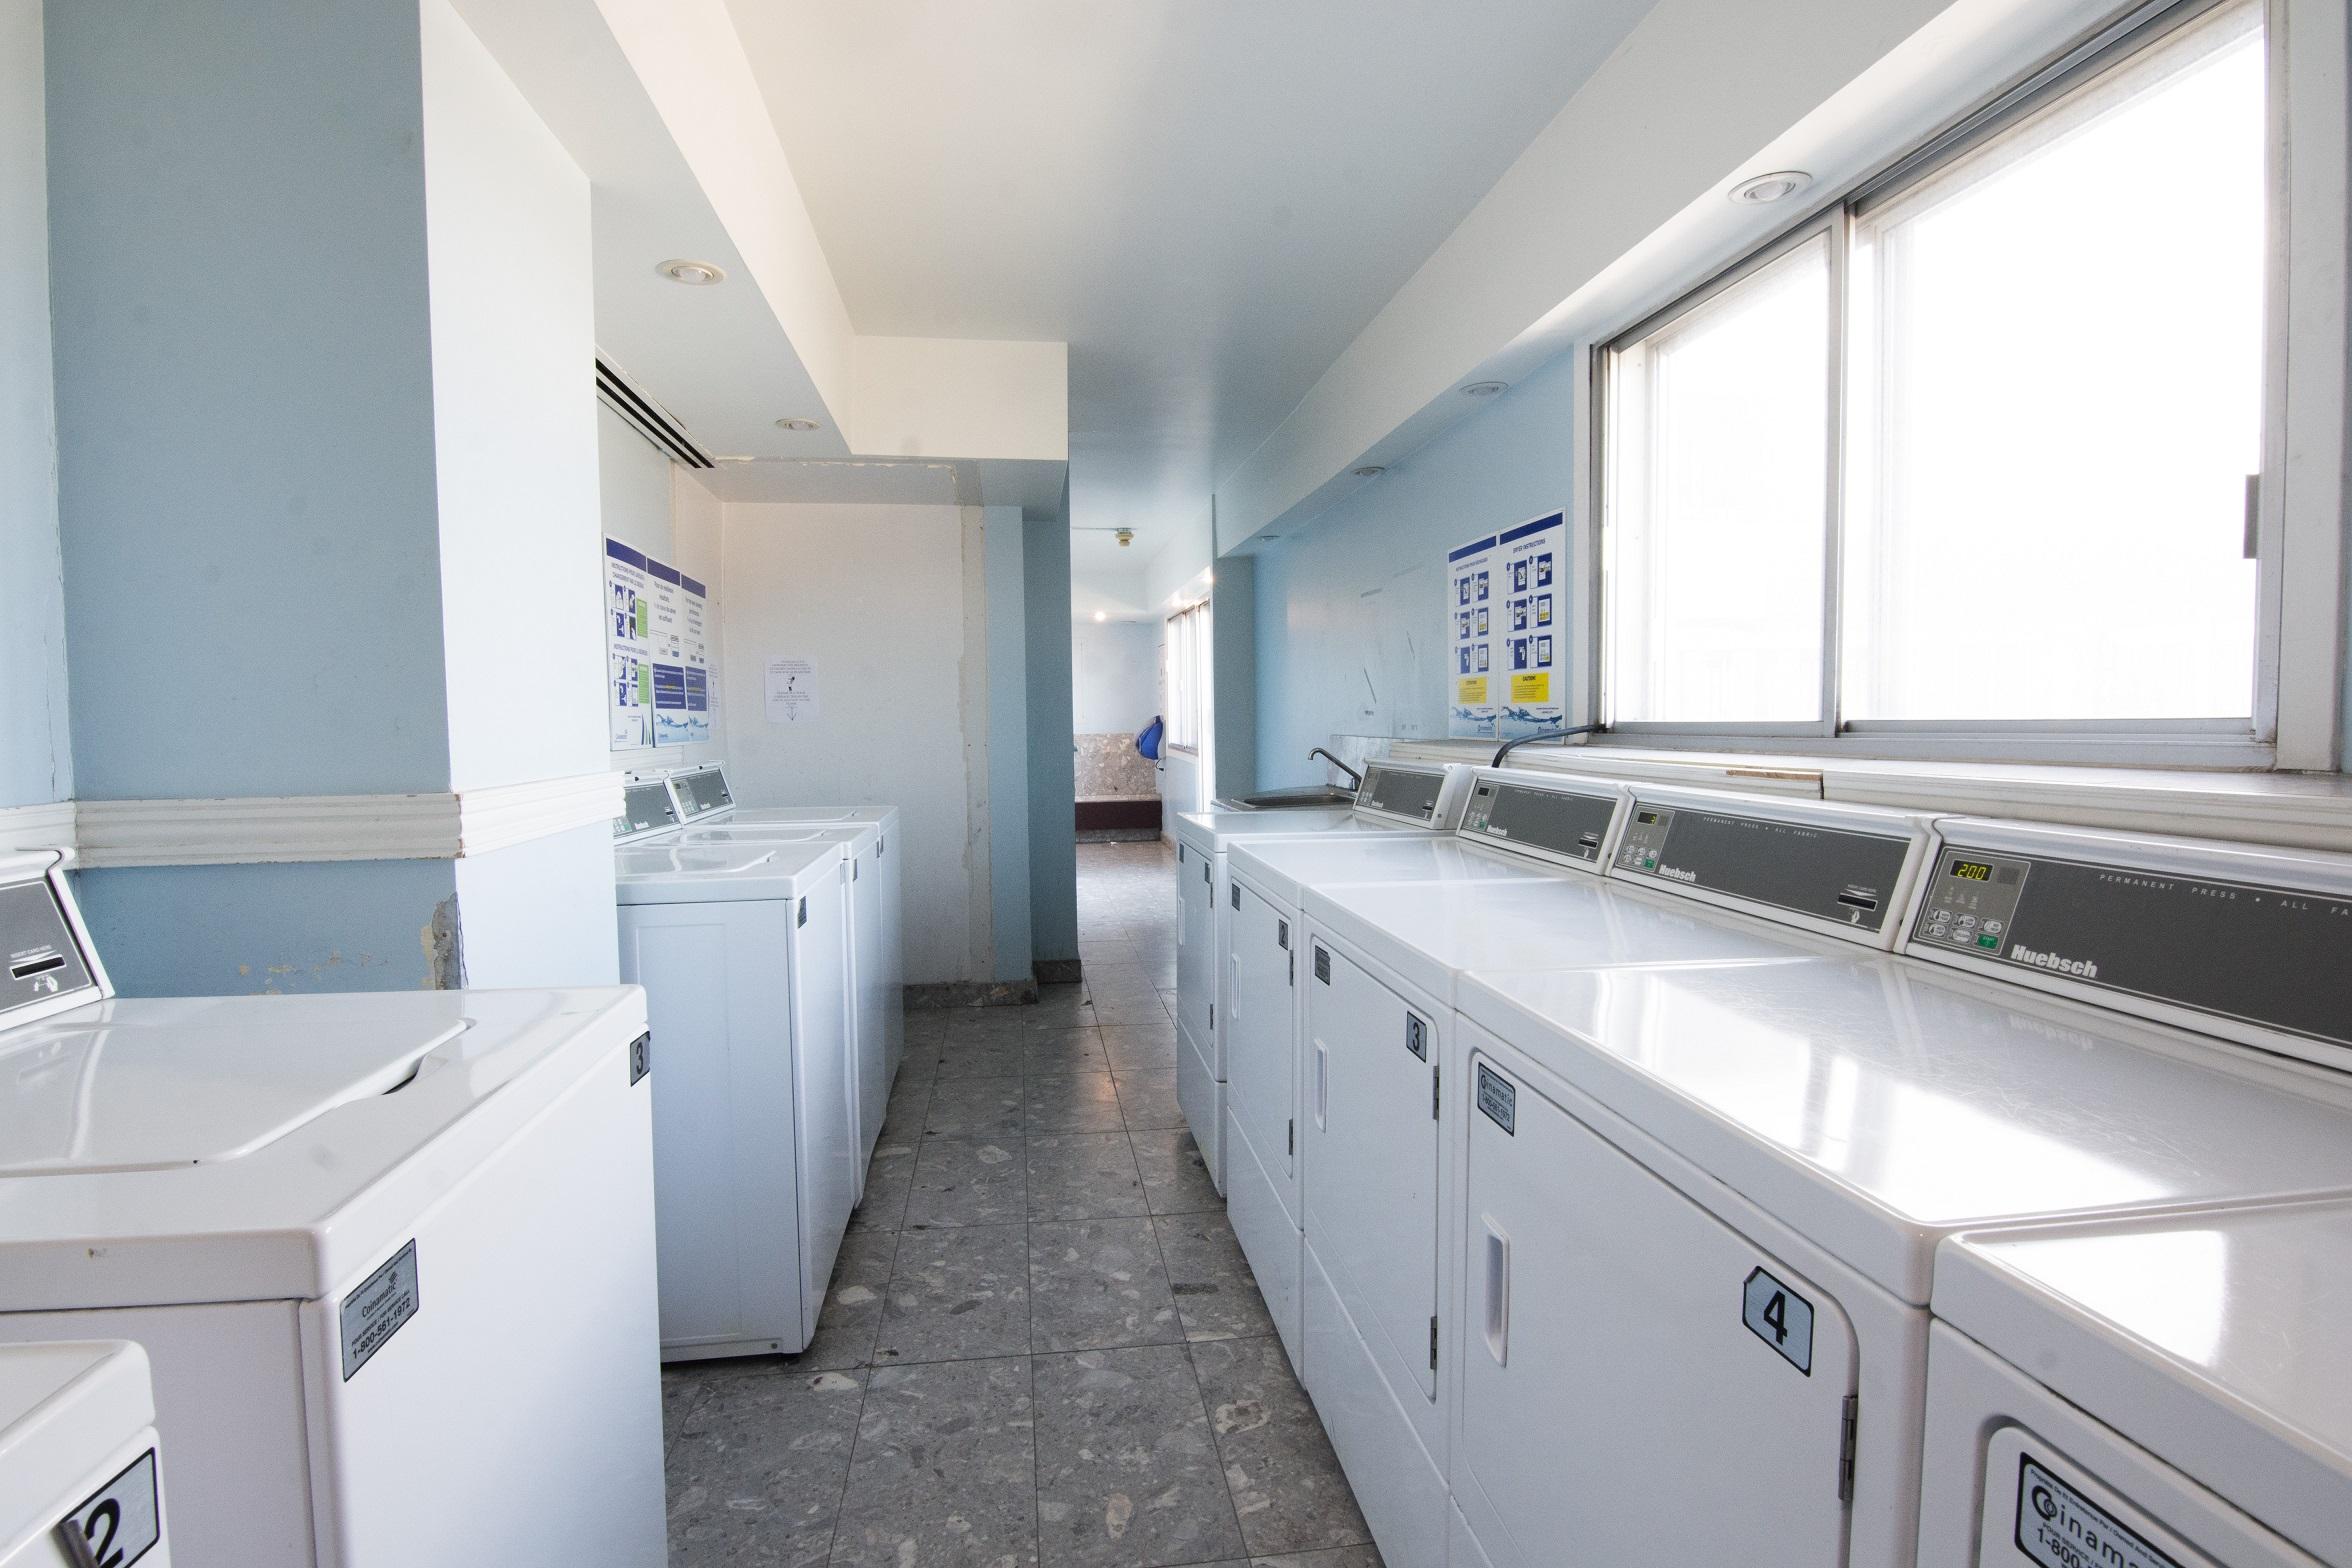 1 bedroom Apartments for rent in Notre-Dame-de-Grace at Tour Girouard - Photo 05 - RentQuebecApartments – L788